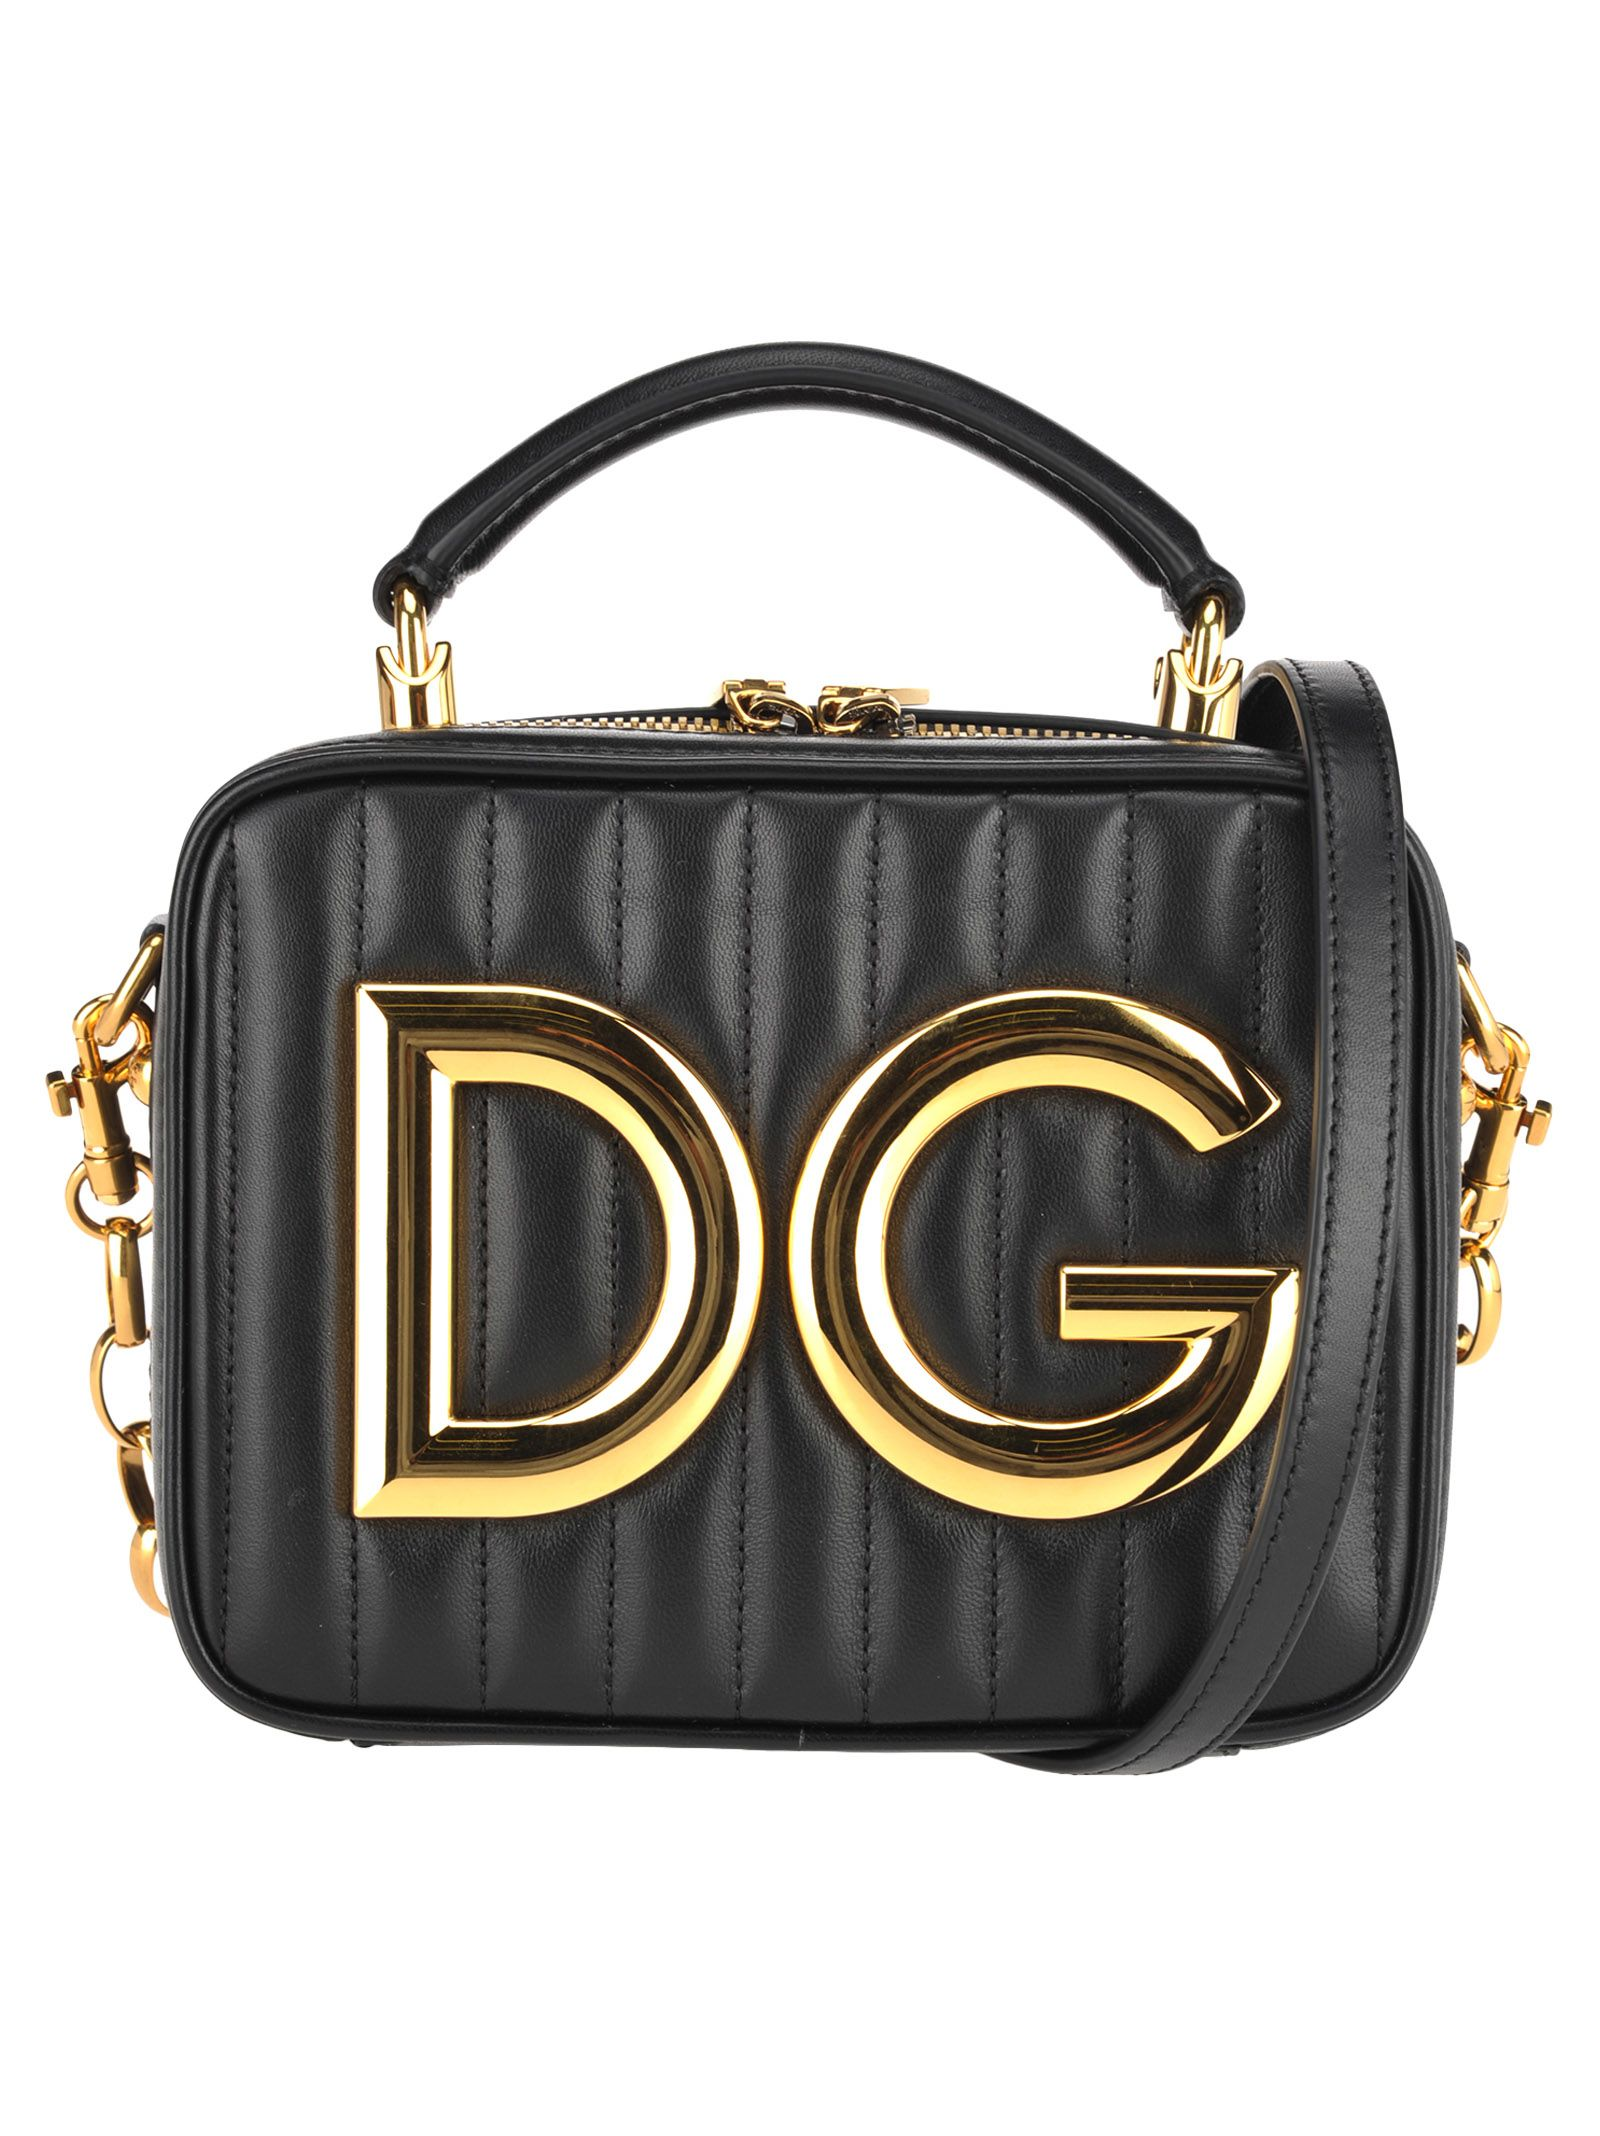 e55aecfe48ef Dolce & Gabbana Dolce&gabbana Dolce & Gabbana Dg Girl Camera Bag - BLACK ...